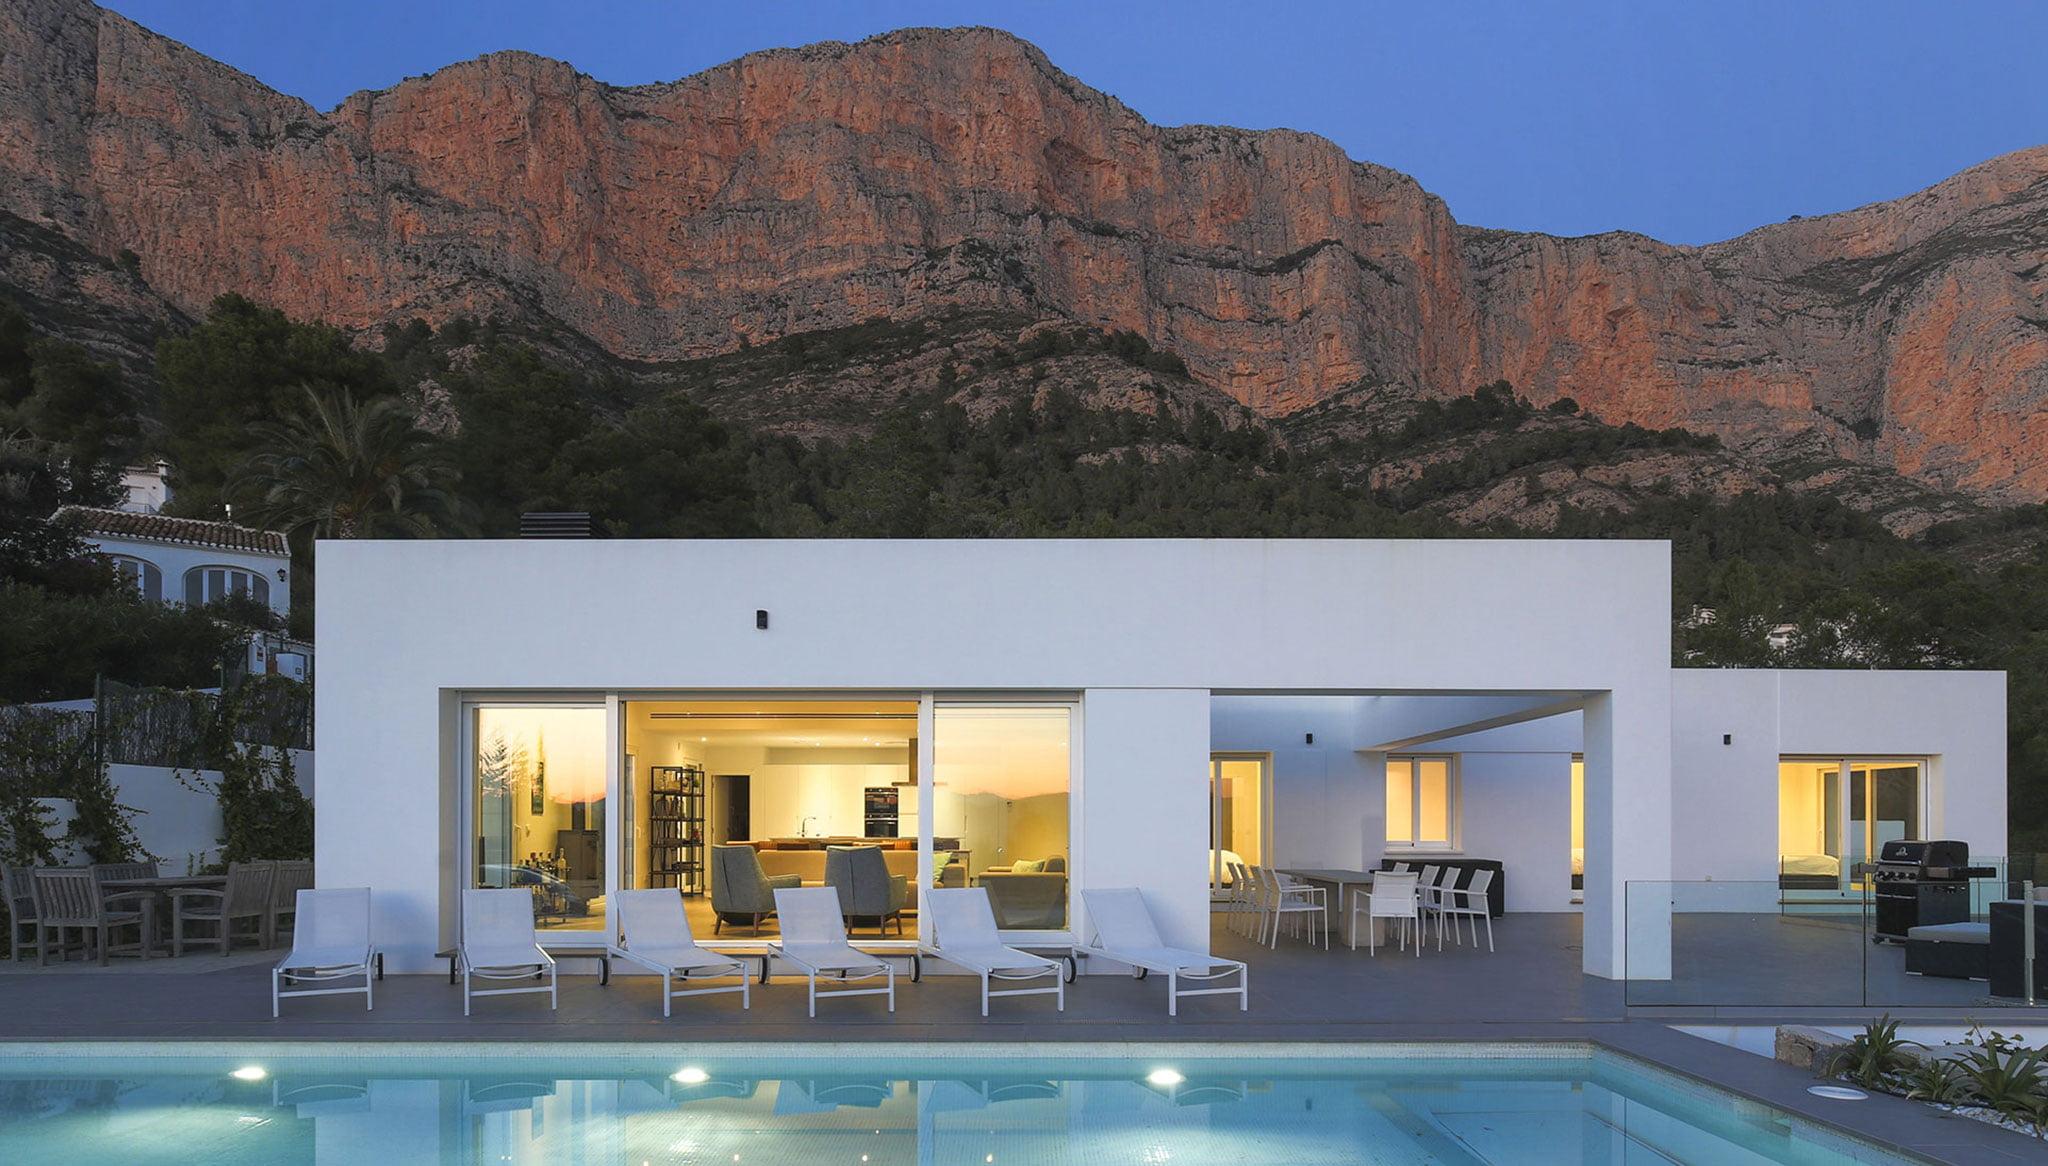 Exterieur villa met Montgó aan de achterkant - Kwaliteit Rent a Villa